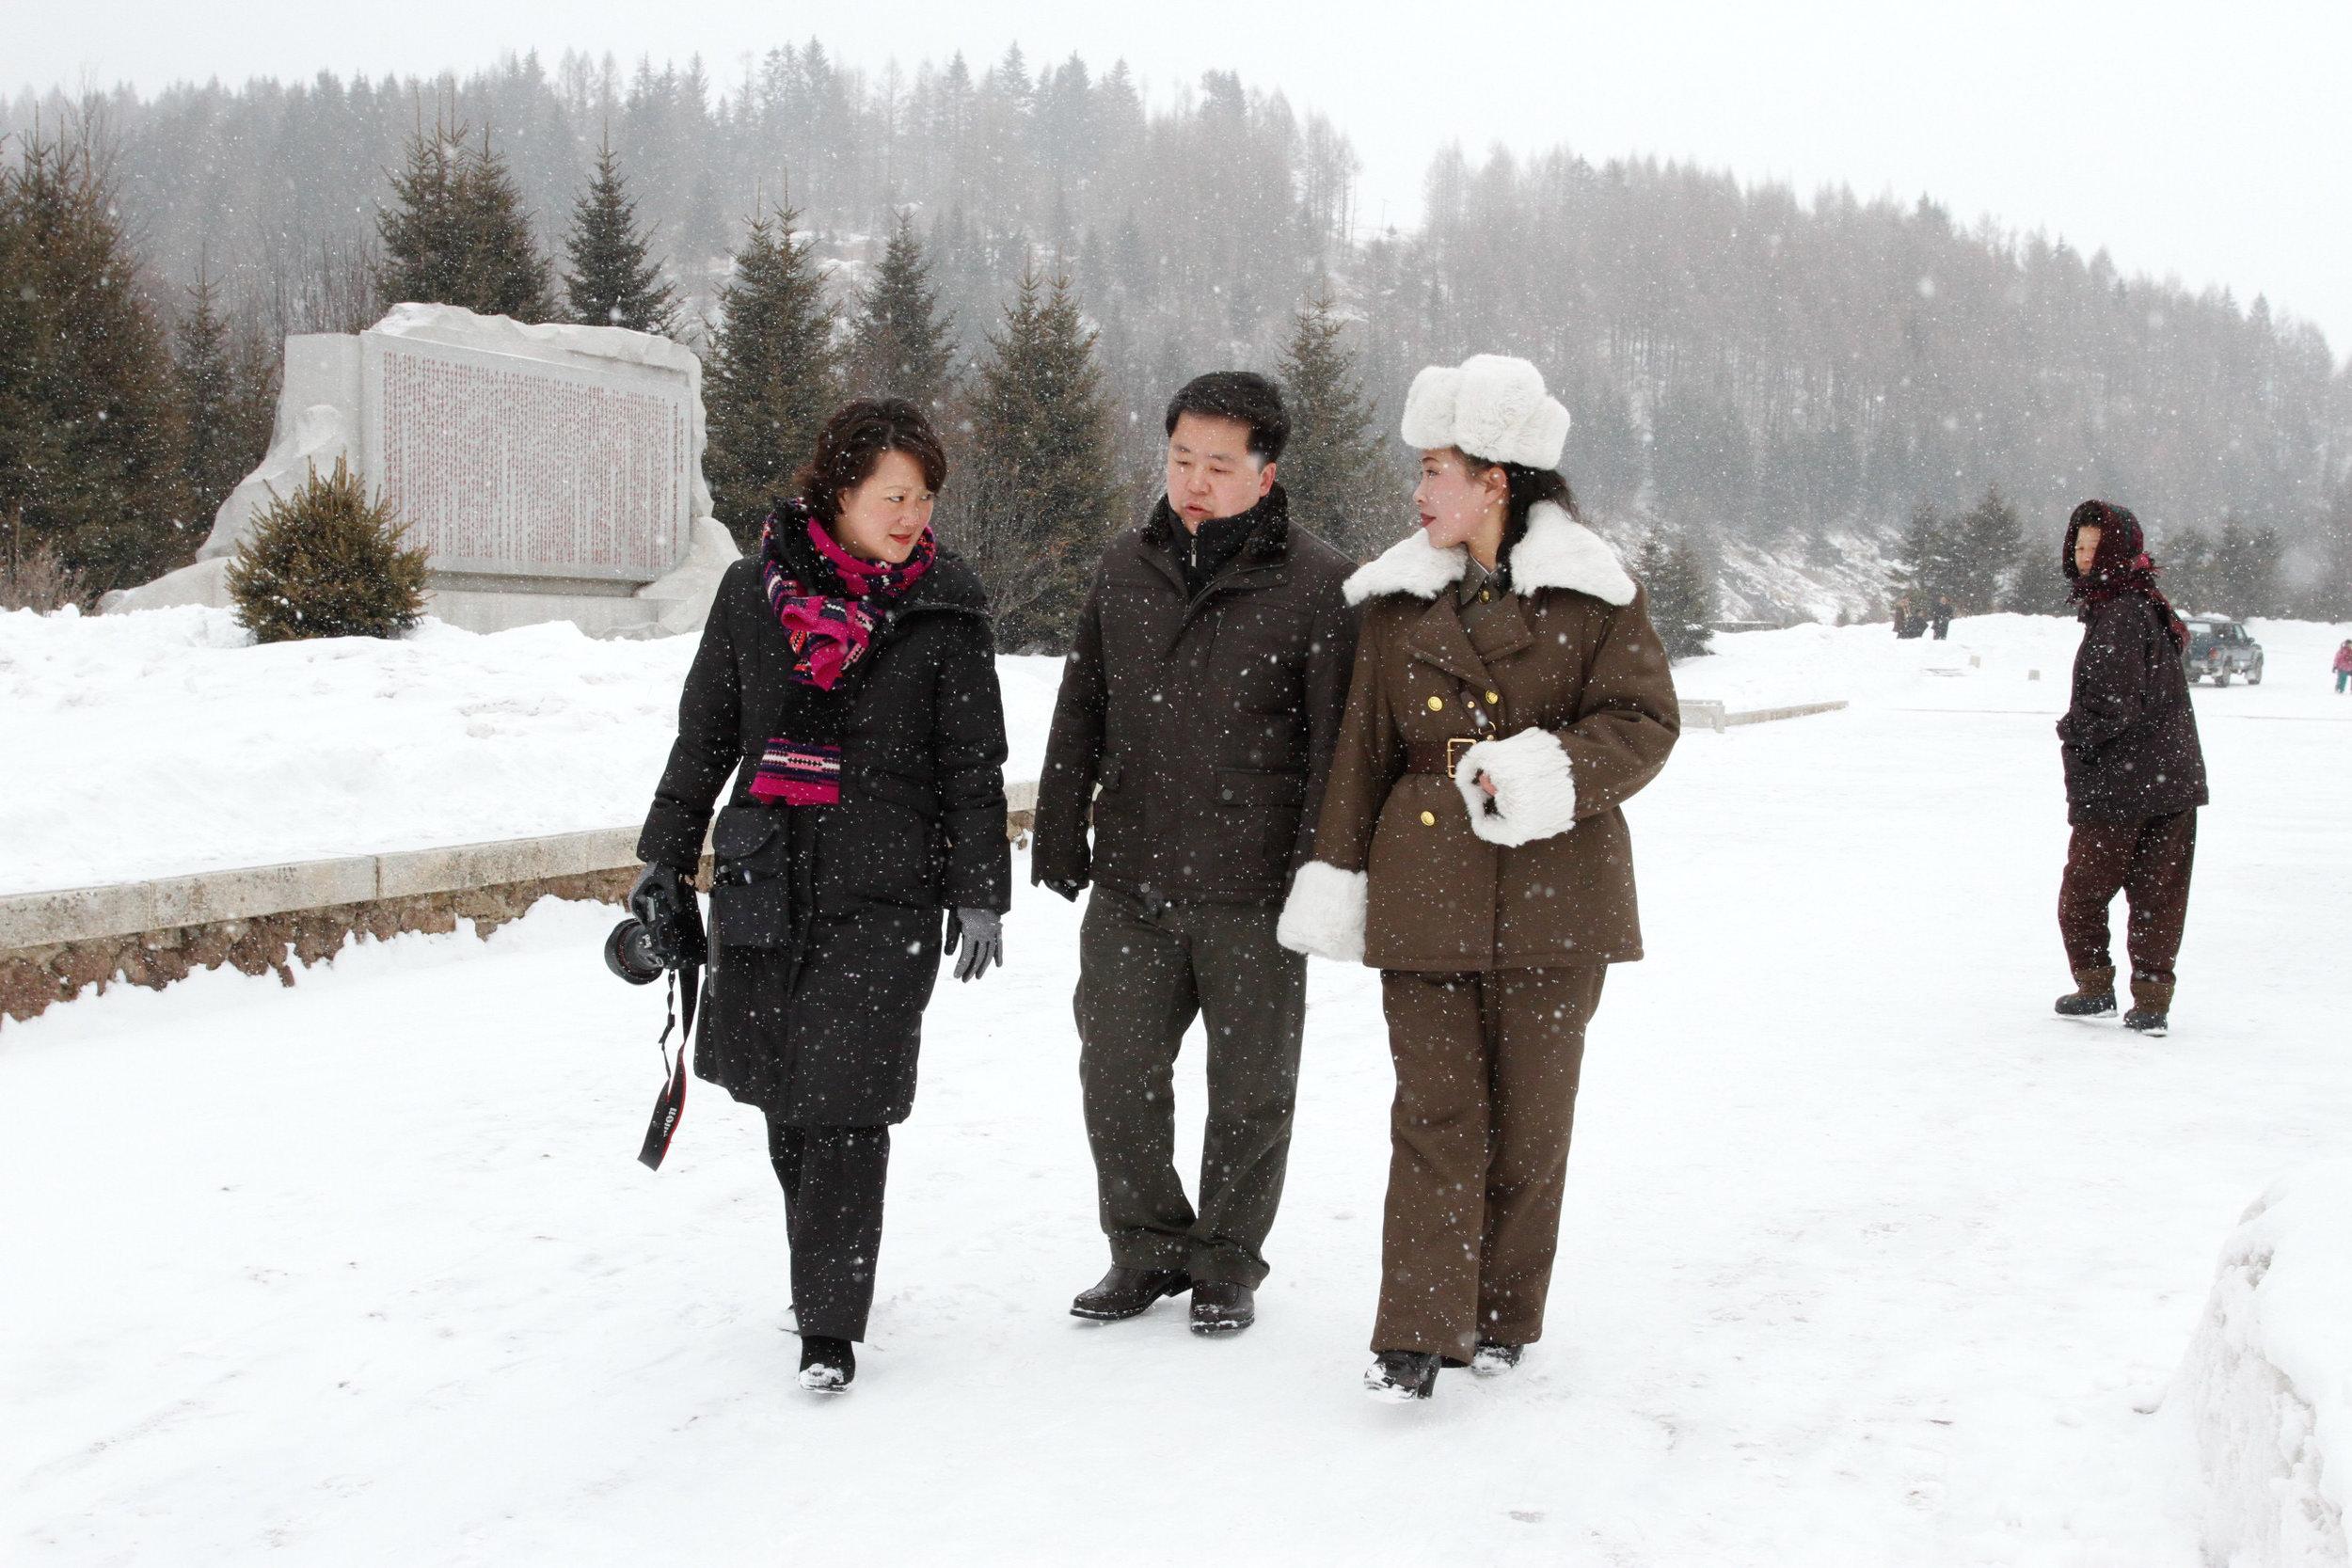 Reporting from Mount Paektu, North Korea.